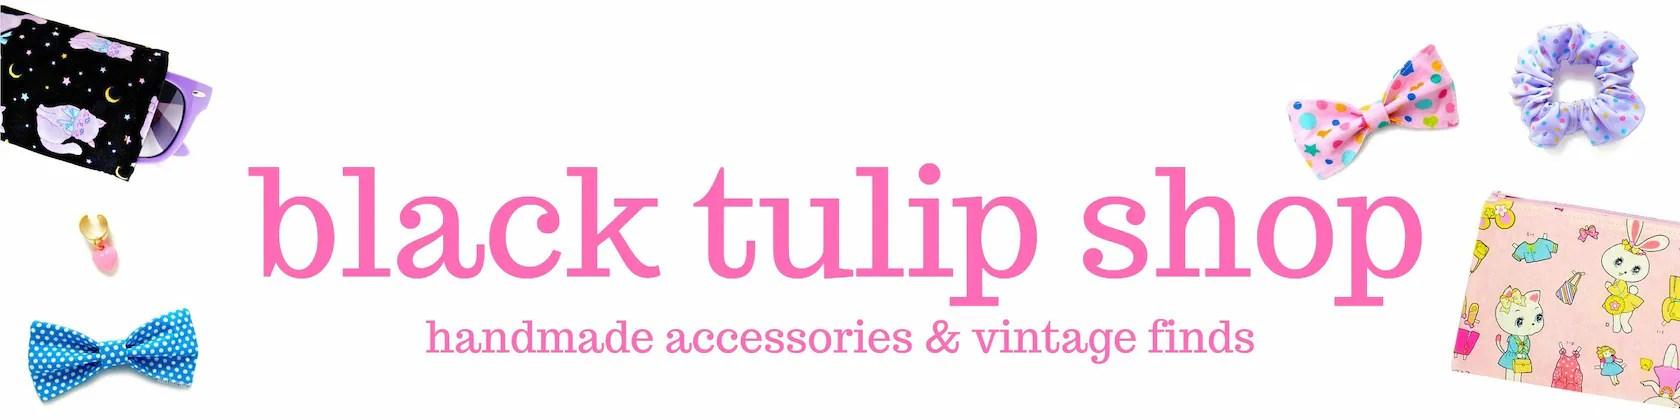 Black Tulip Shop Handmade Kawaii accessories vintage finds harajuku pastel